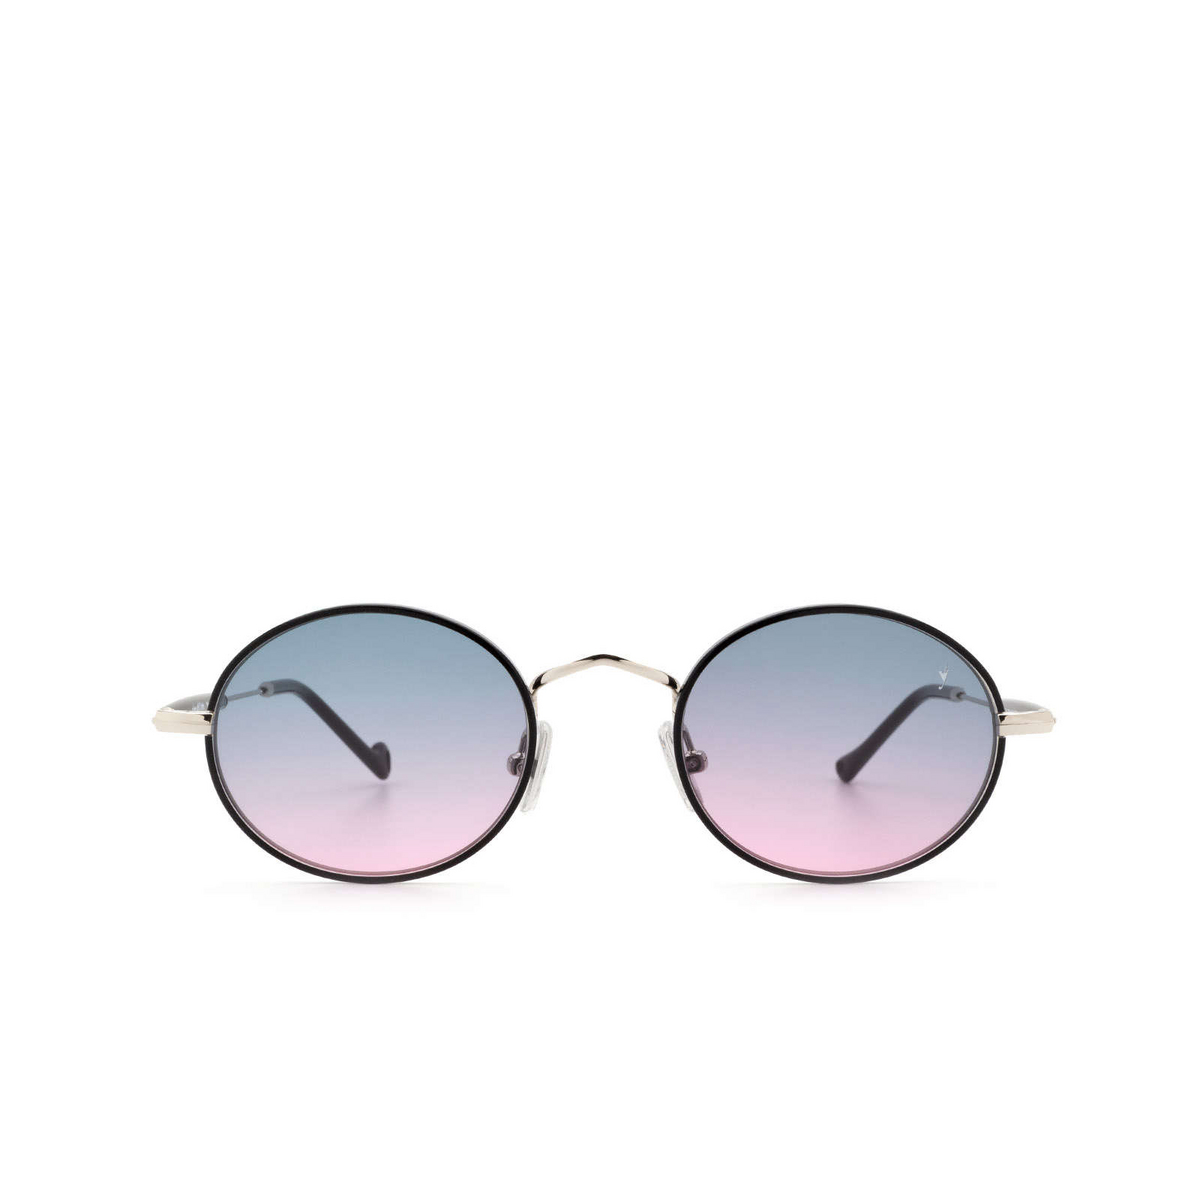 Eyepetizer® Round Sunglasses: Un color Black C.1-F-A-20 - front view.